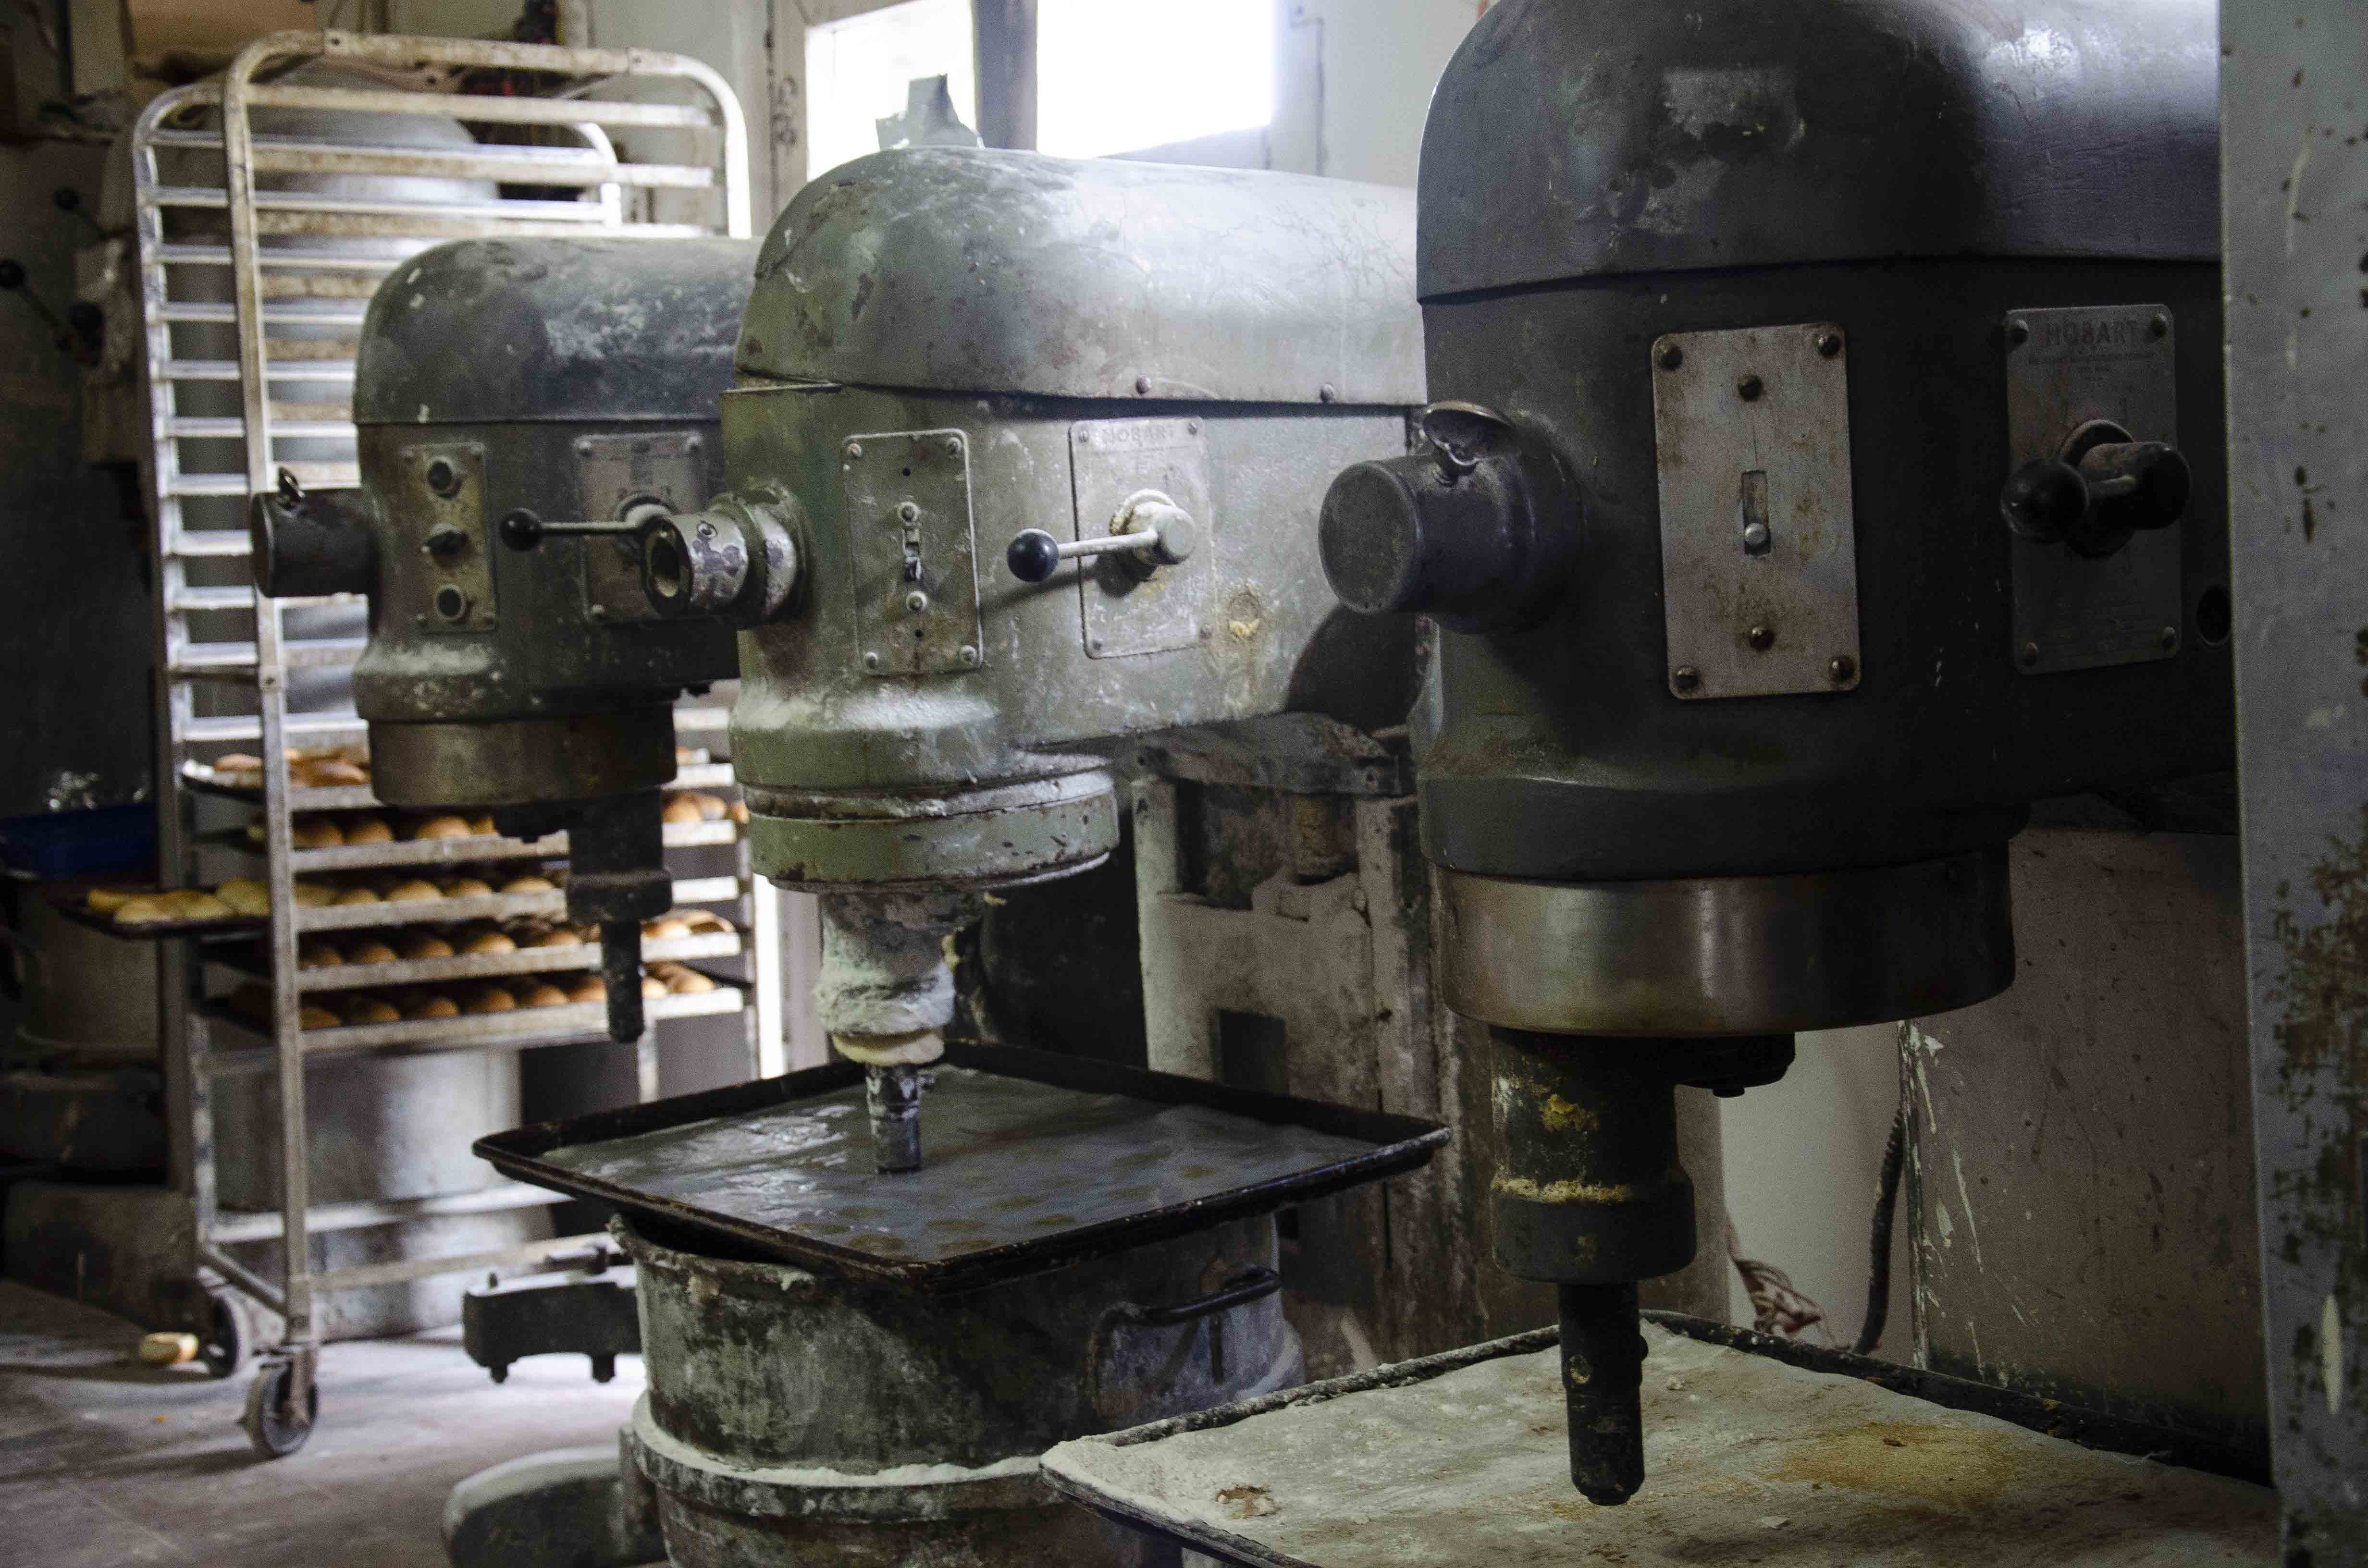 Model Bakery mixers